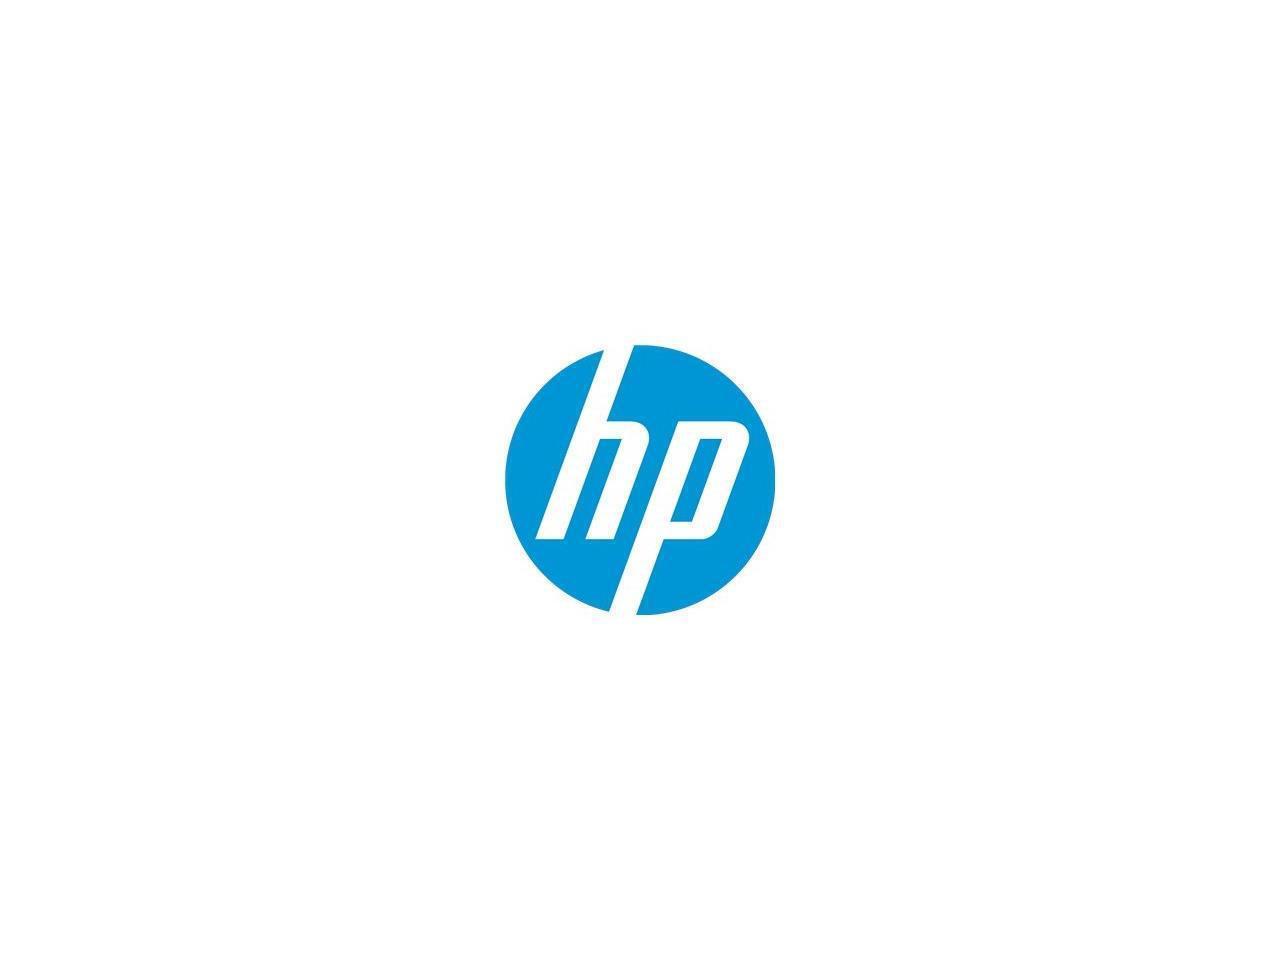 intel-xeon-e7-4820_HP Xeon E7-4820 2 GHz Processor Upgrade - Socket LGA-1567 - Newegg.com